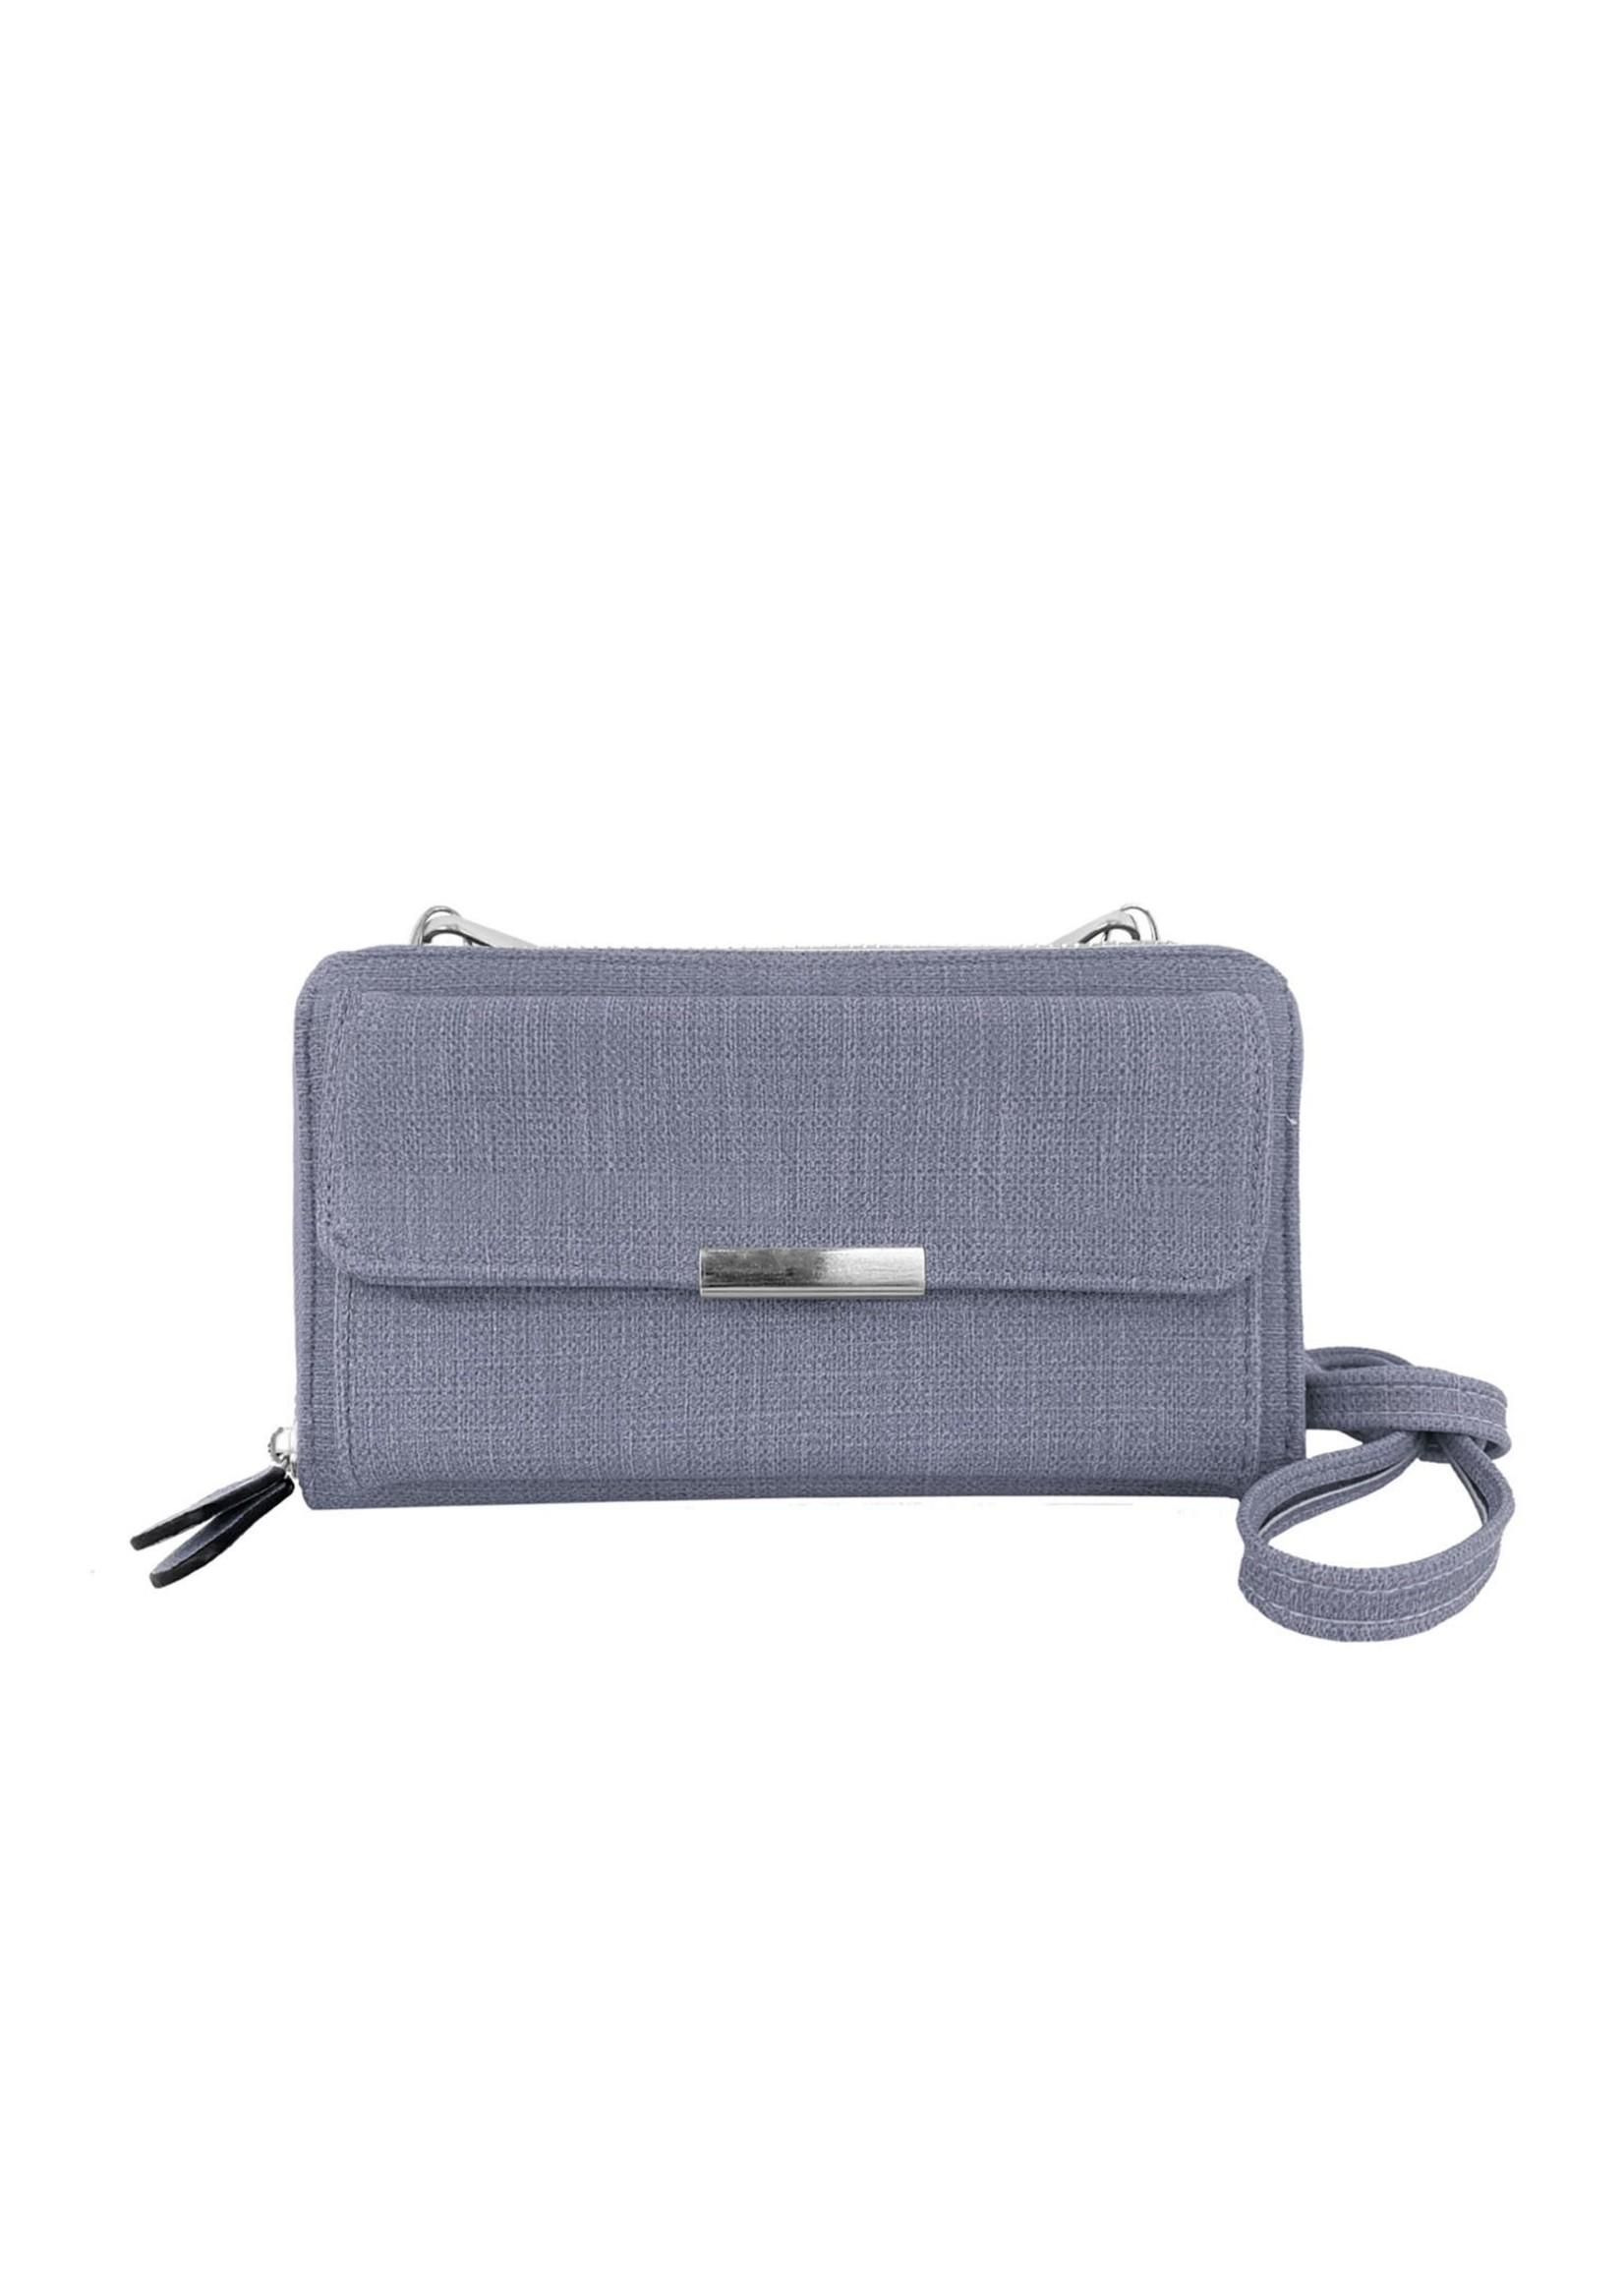 Caracol Light Grey 2 In 1 Purse/Wallet